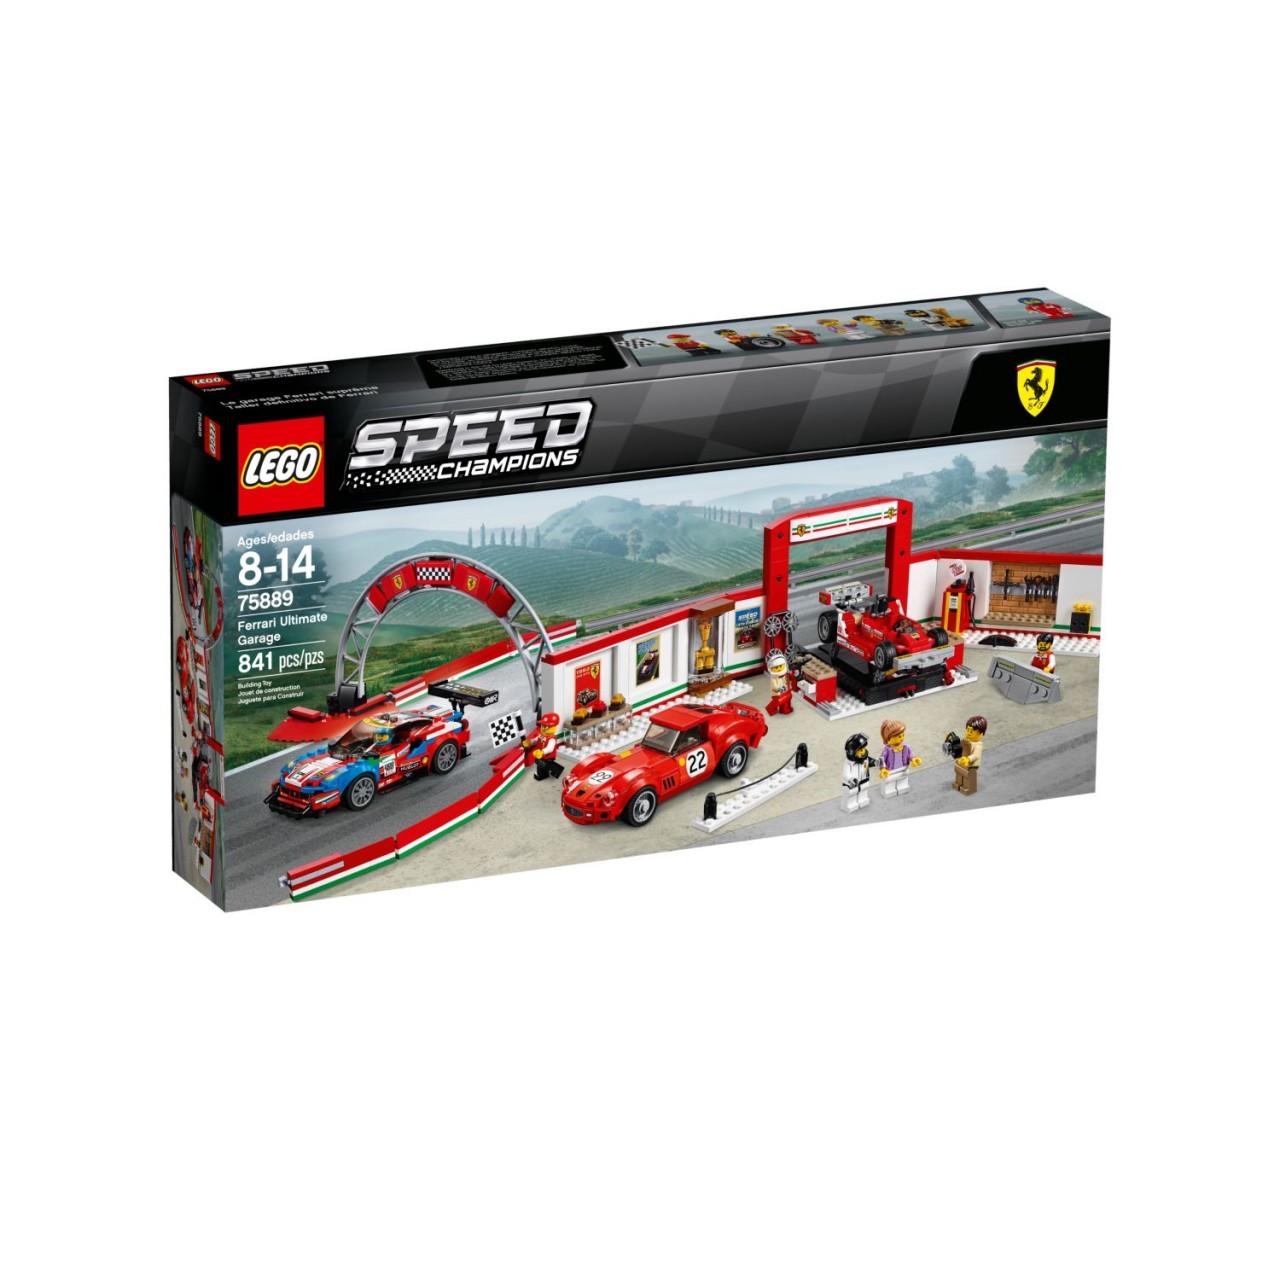 LEGO SPEED CHAMPIONS 75889 Ferrari Ultimative Garage